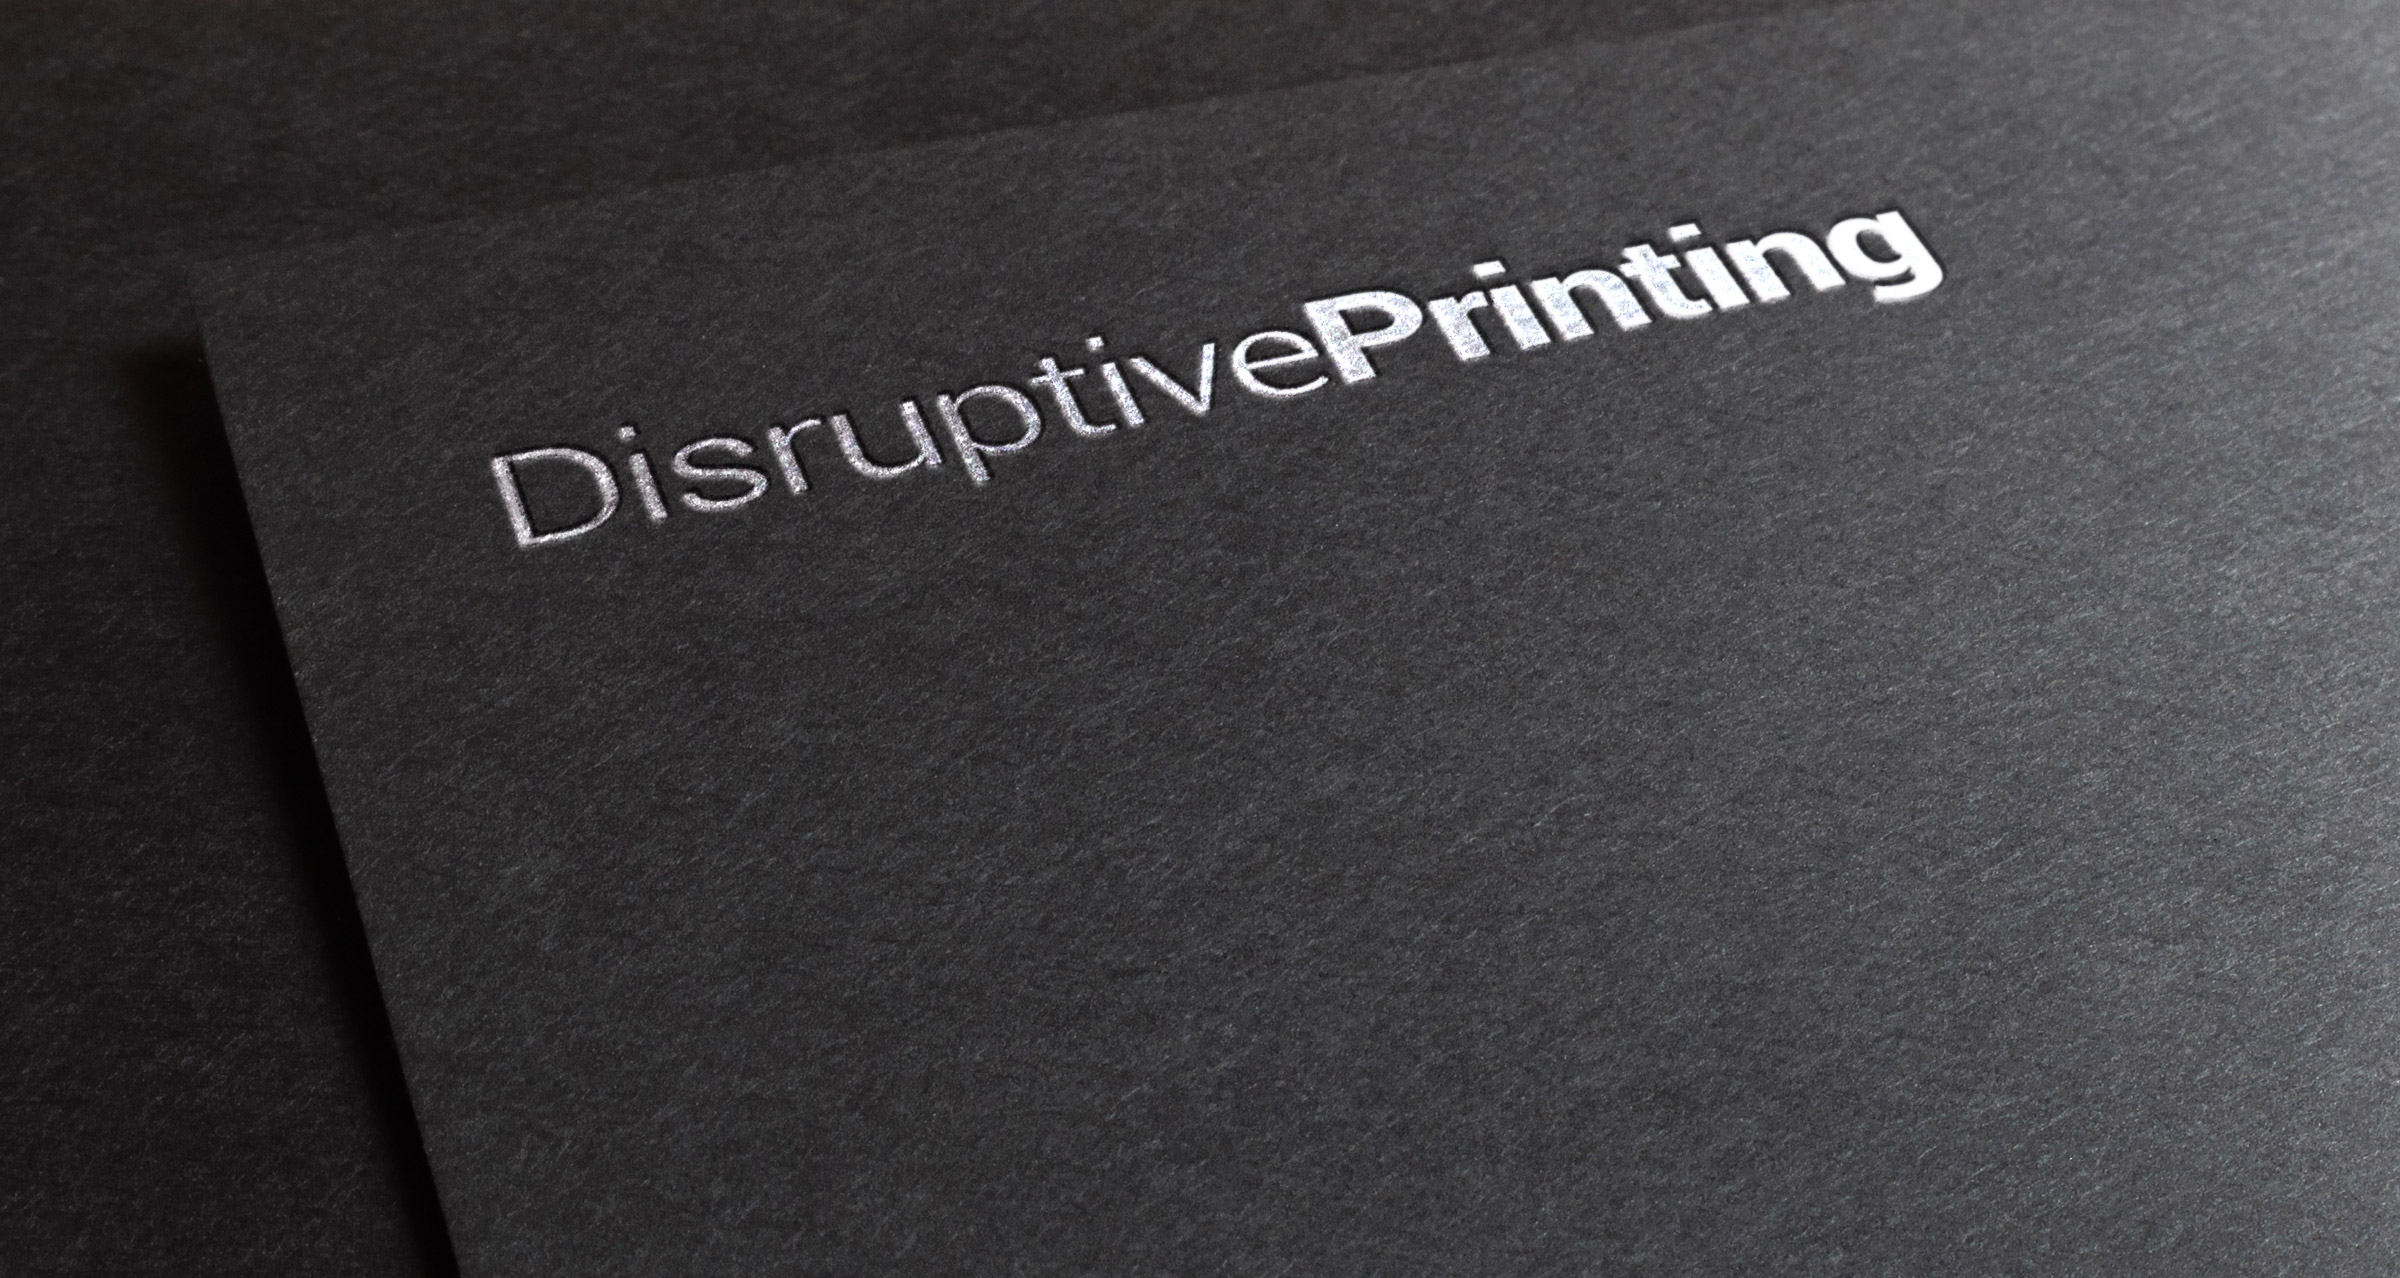 d-printing